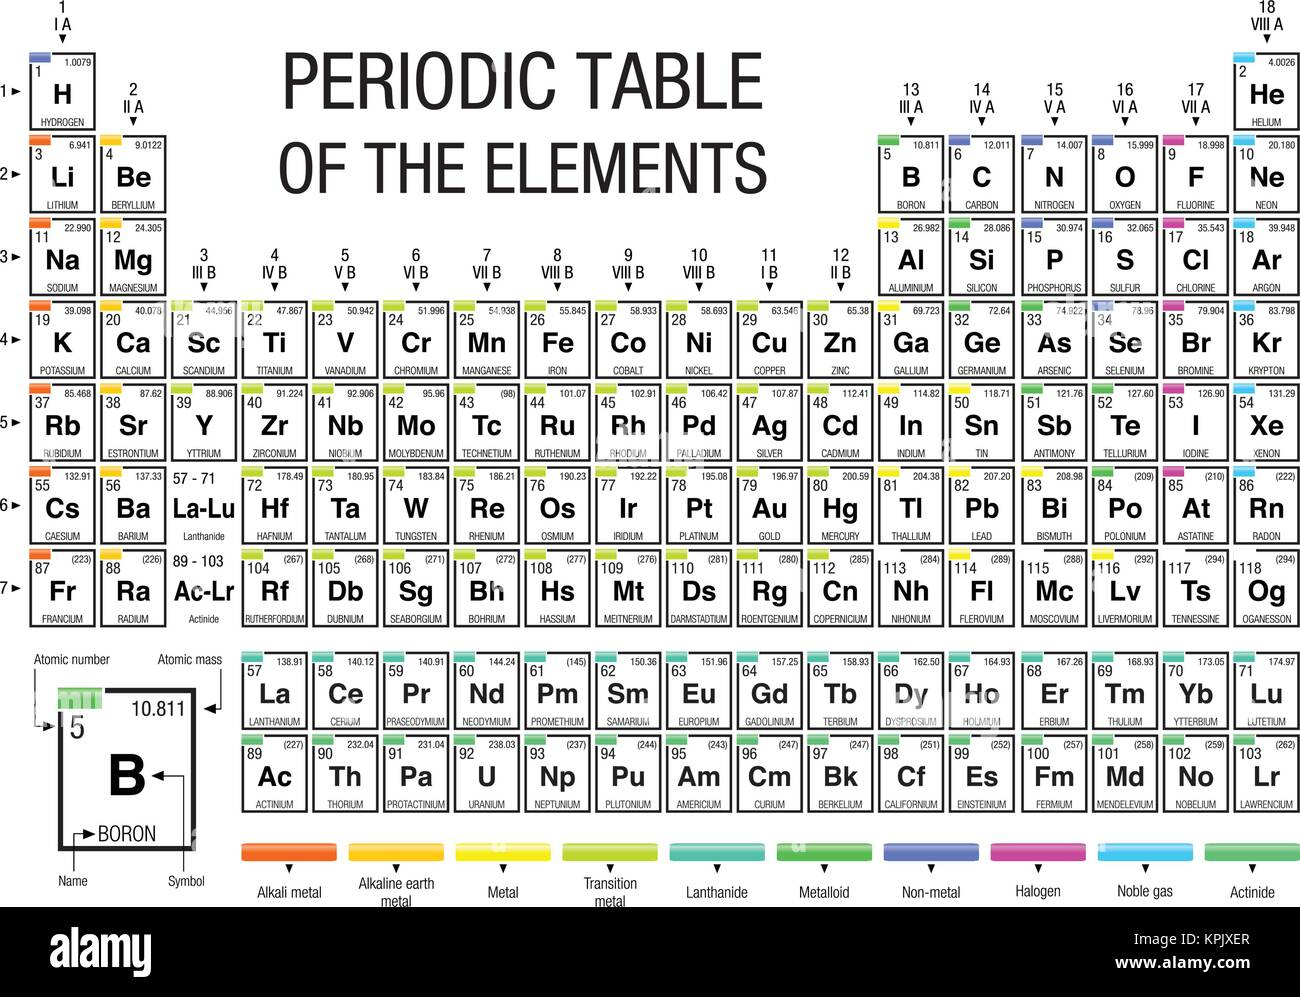 Tabla periodica en blanco con elementos choice image periodic tabla peridica de los elementos de fondo blanco con los 4 nuevos tabla peridica de los urtaz Choice Image